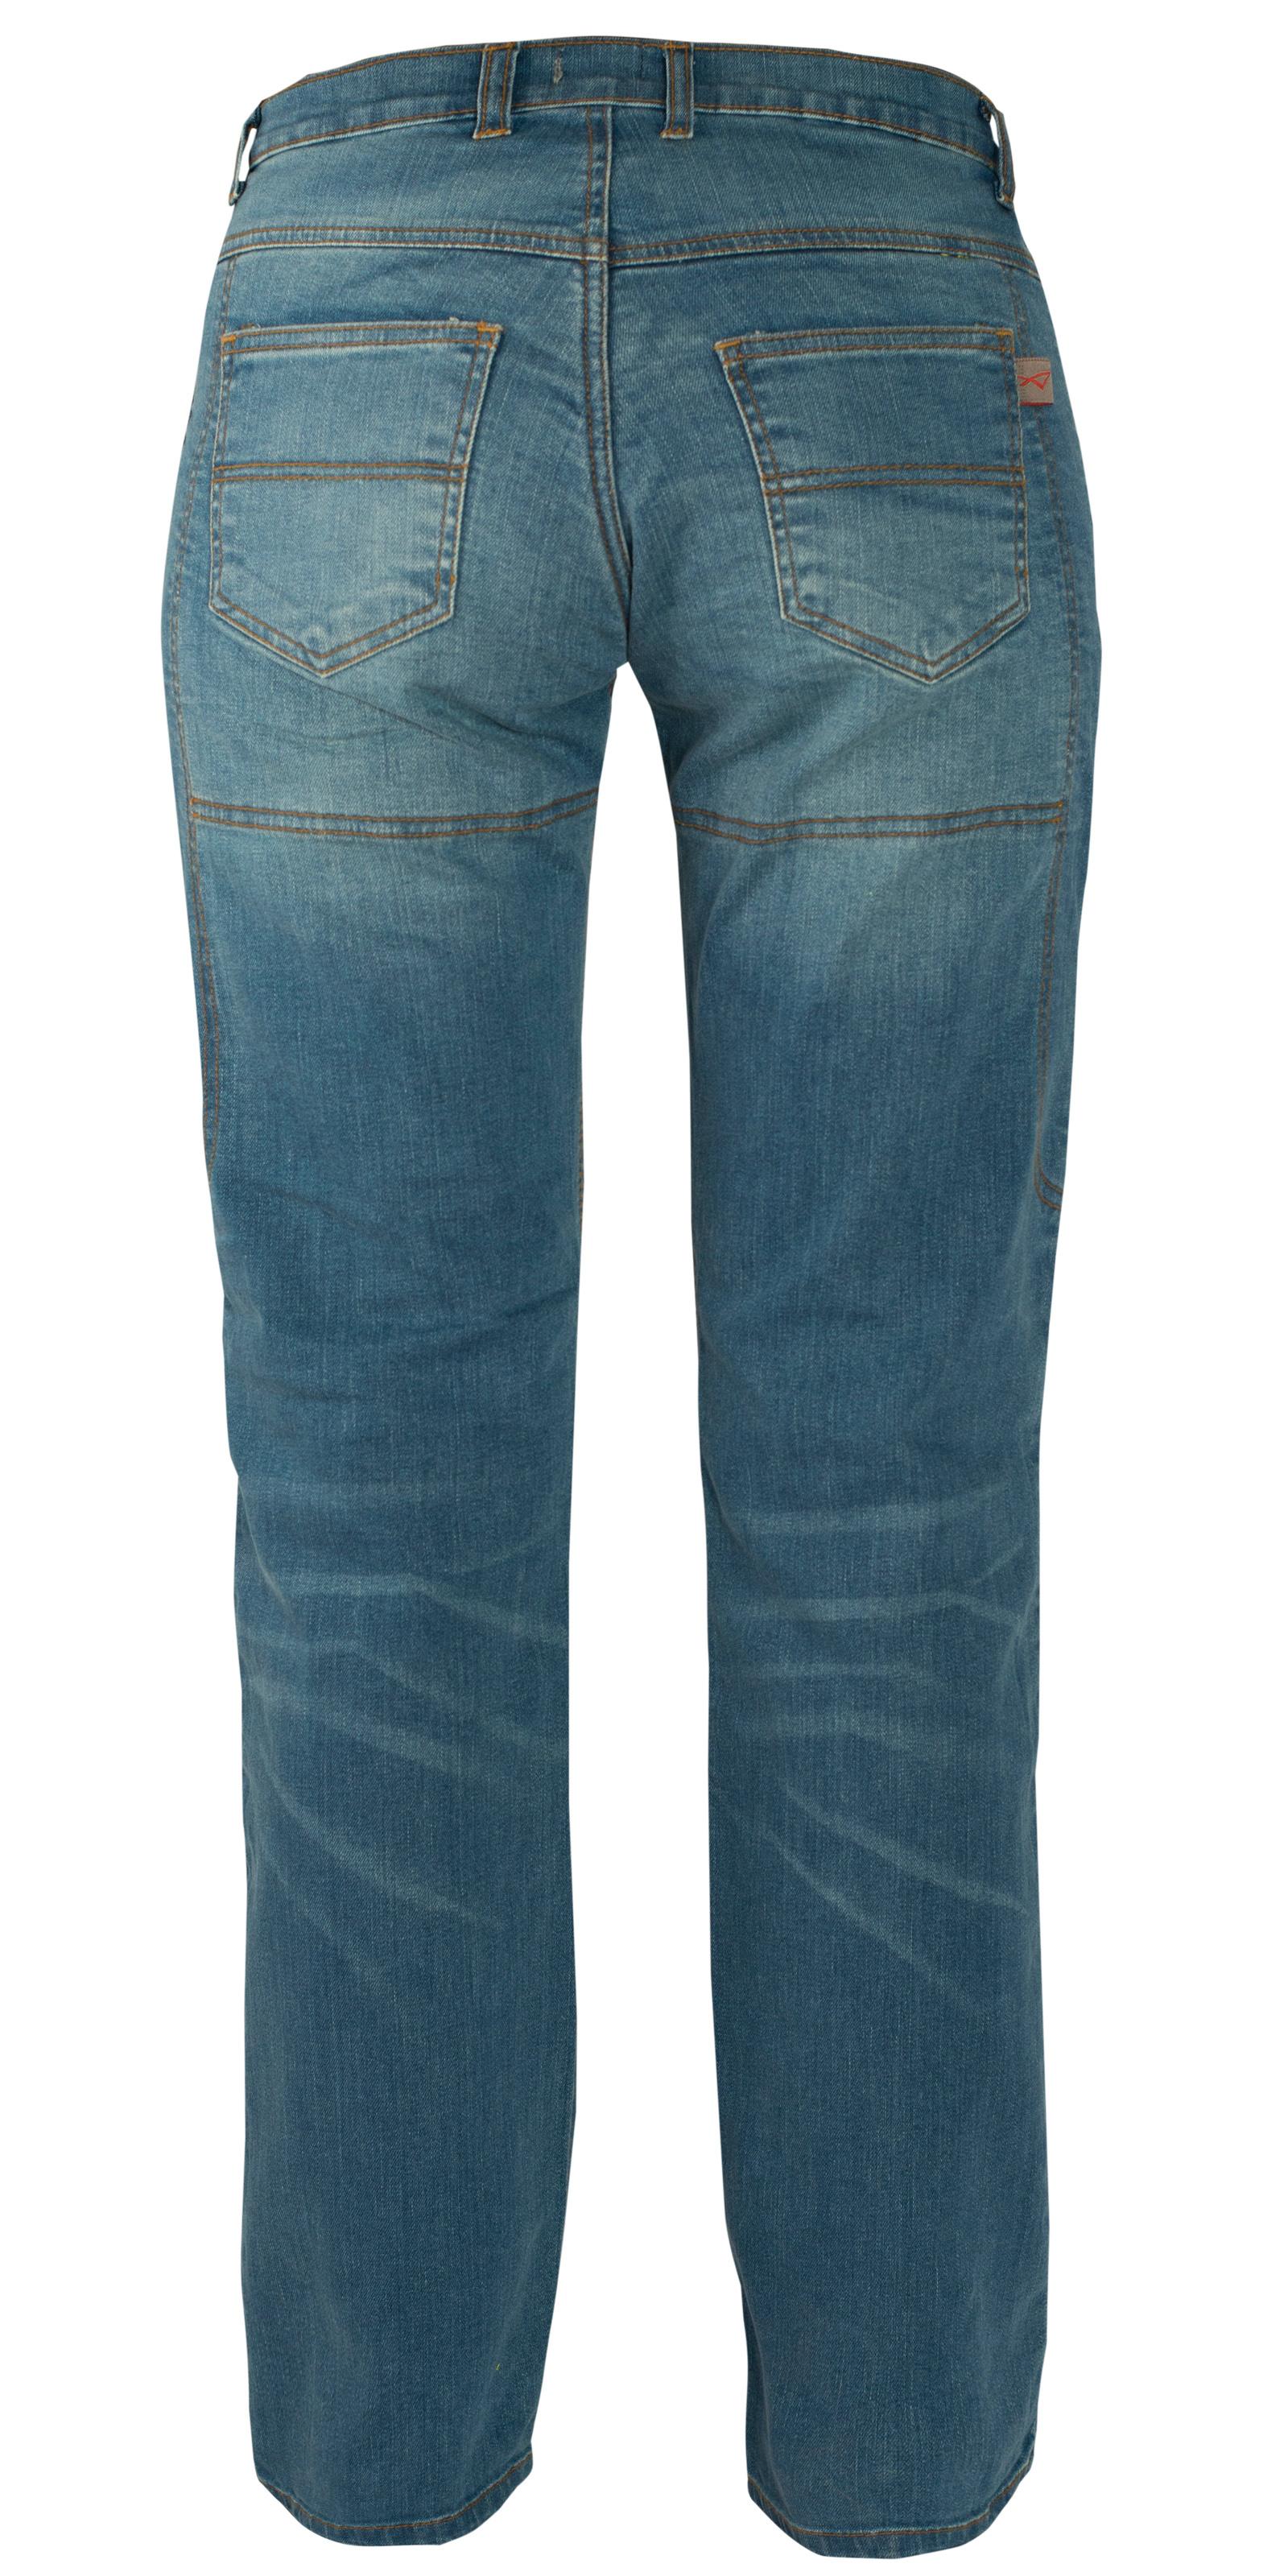 Pantalon-Femme-Jeans-Moto-Protections-Homologees-Renforts-Bleu